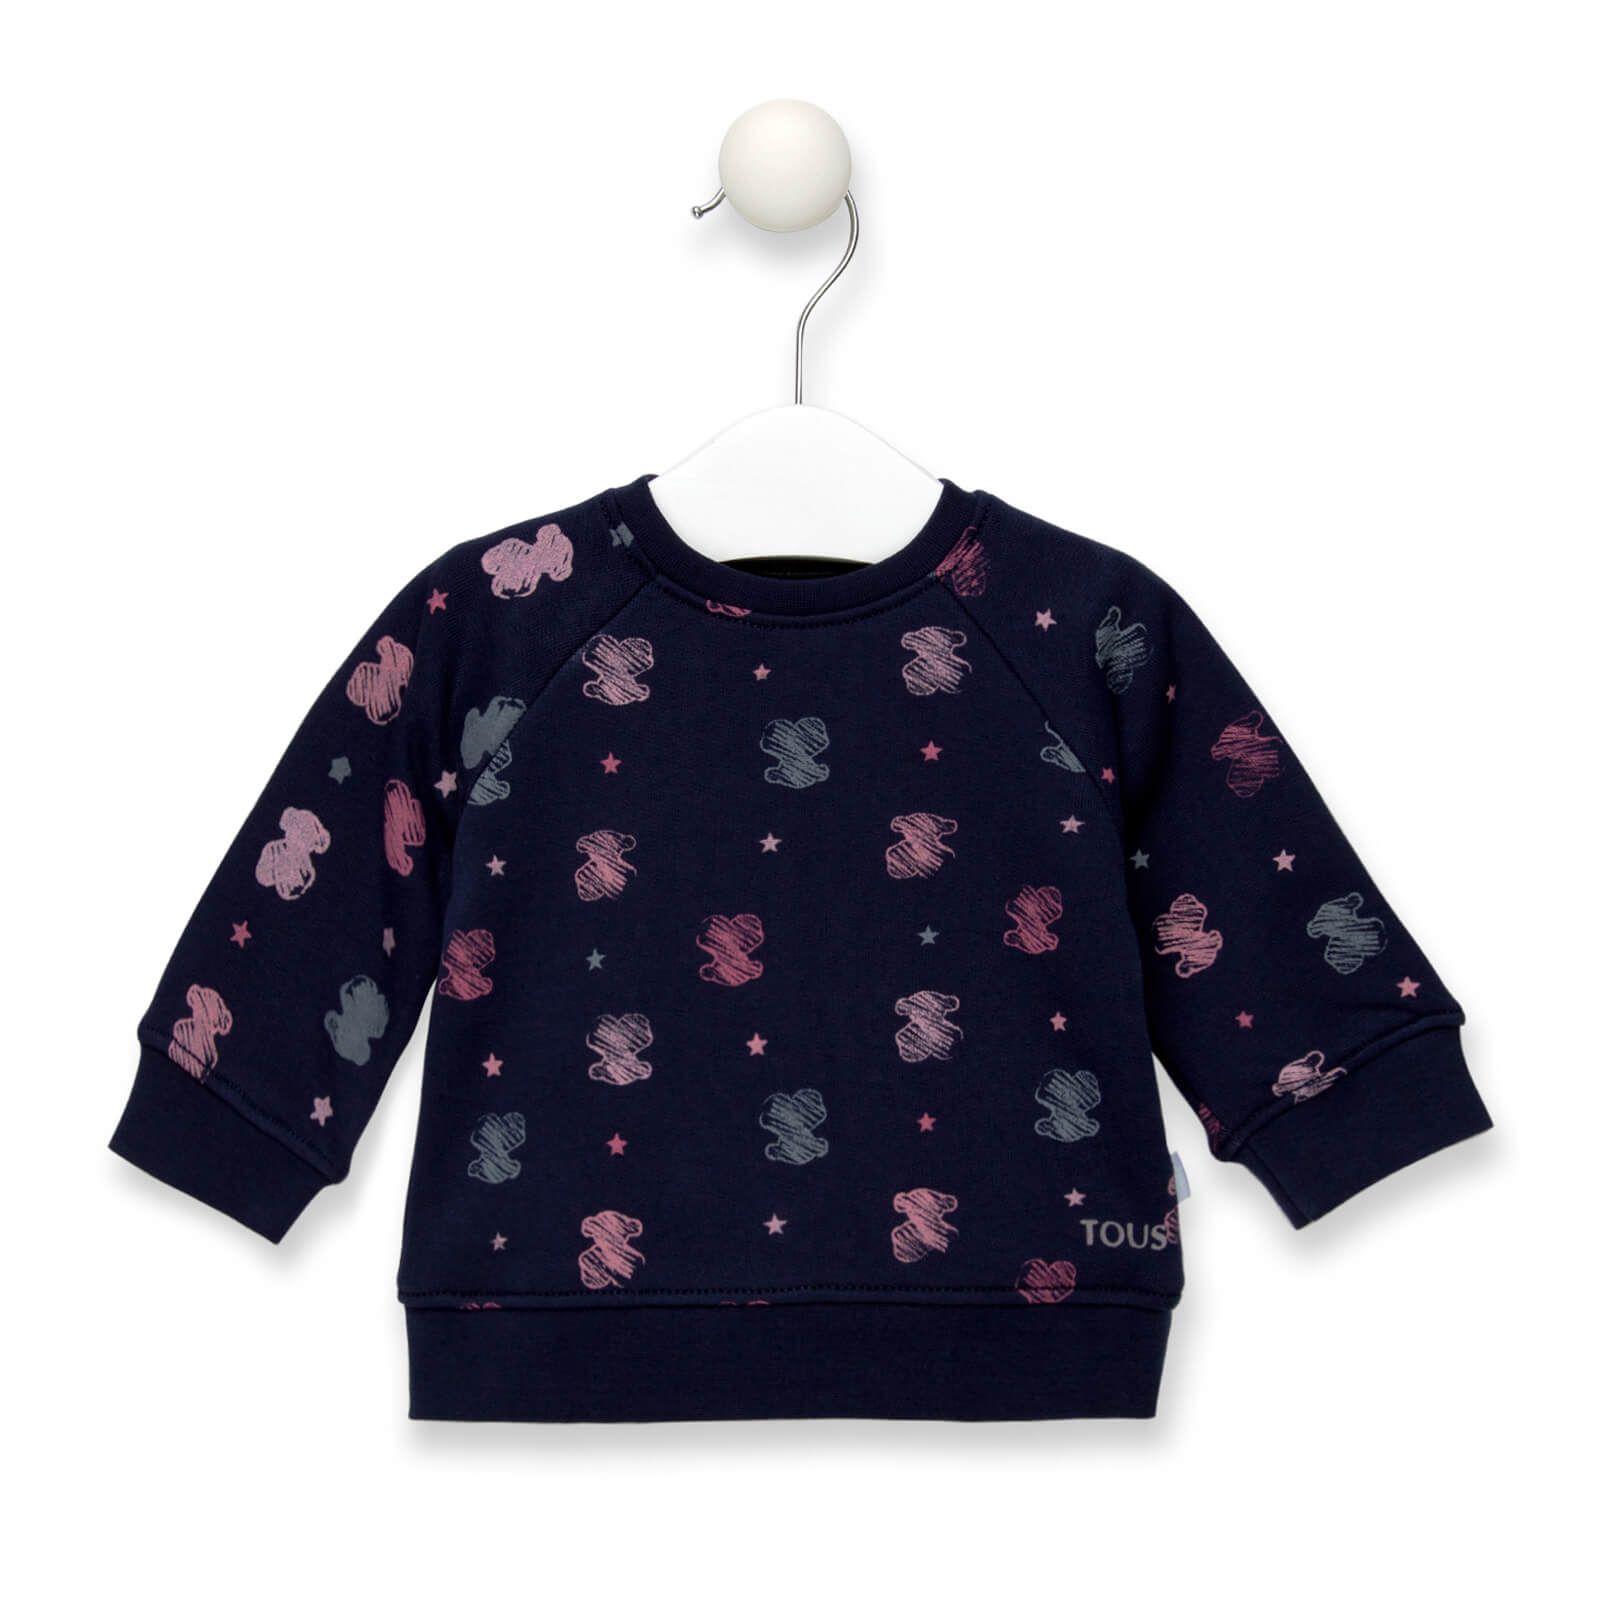 441fbac5a Abrigo niño baby tous orleans-910   BABY TOUS   Coat, Fur Coat y Jackets